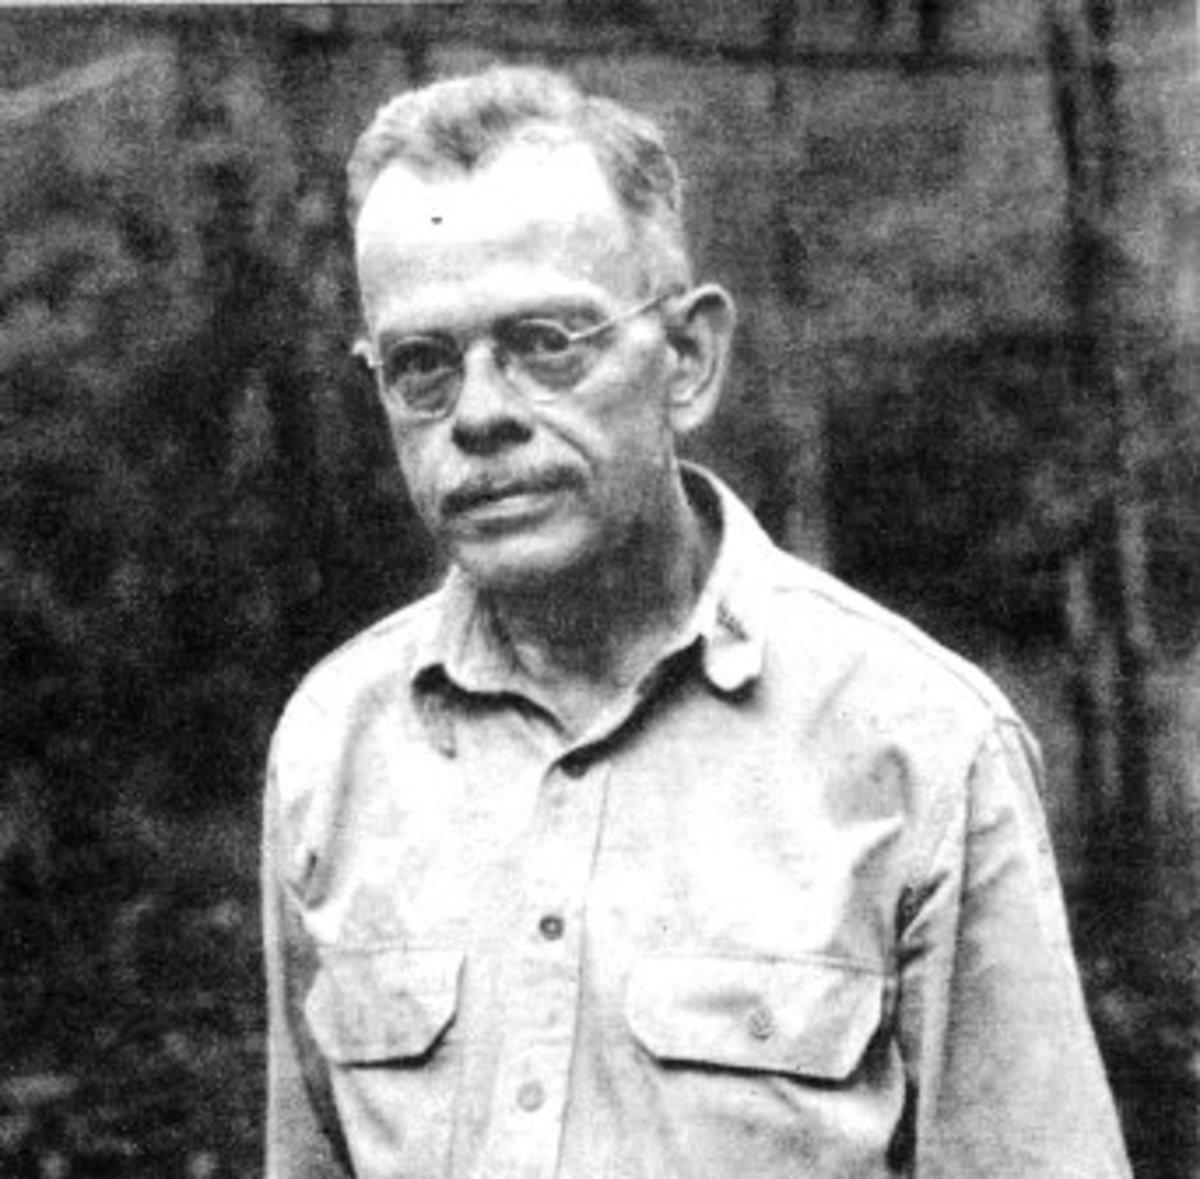 DR GORDON SEAGRAVE